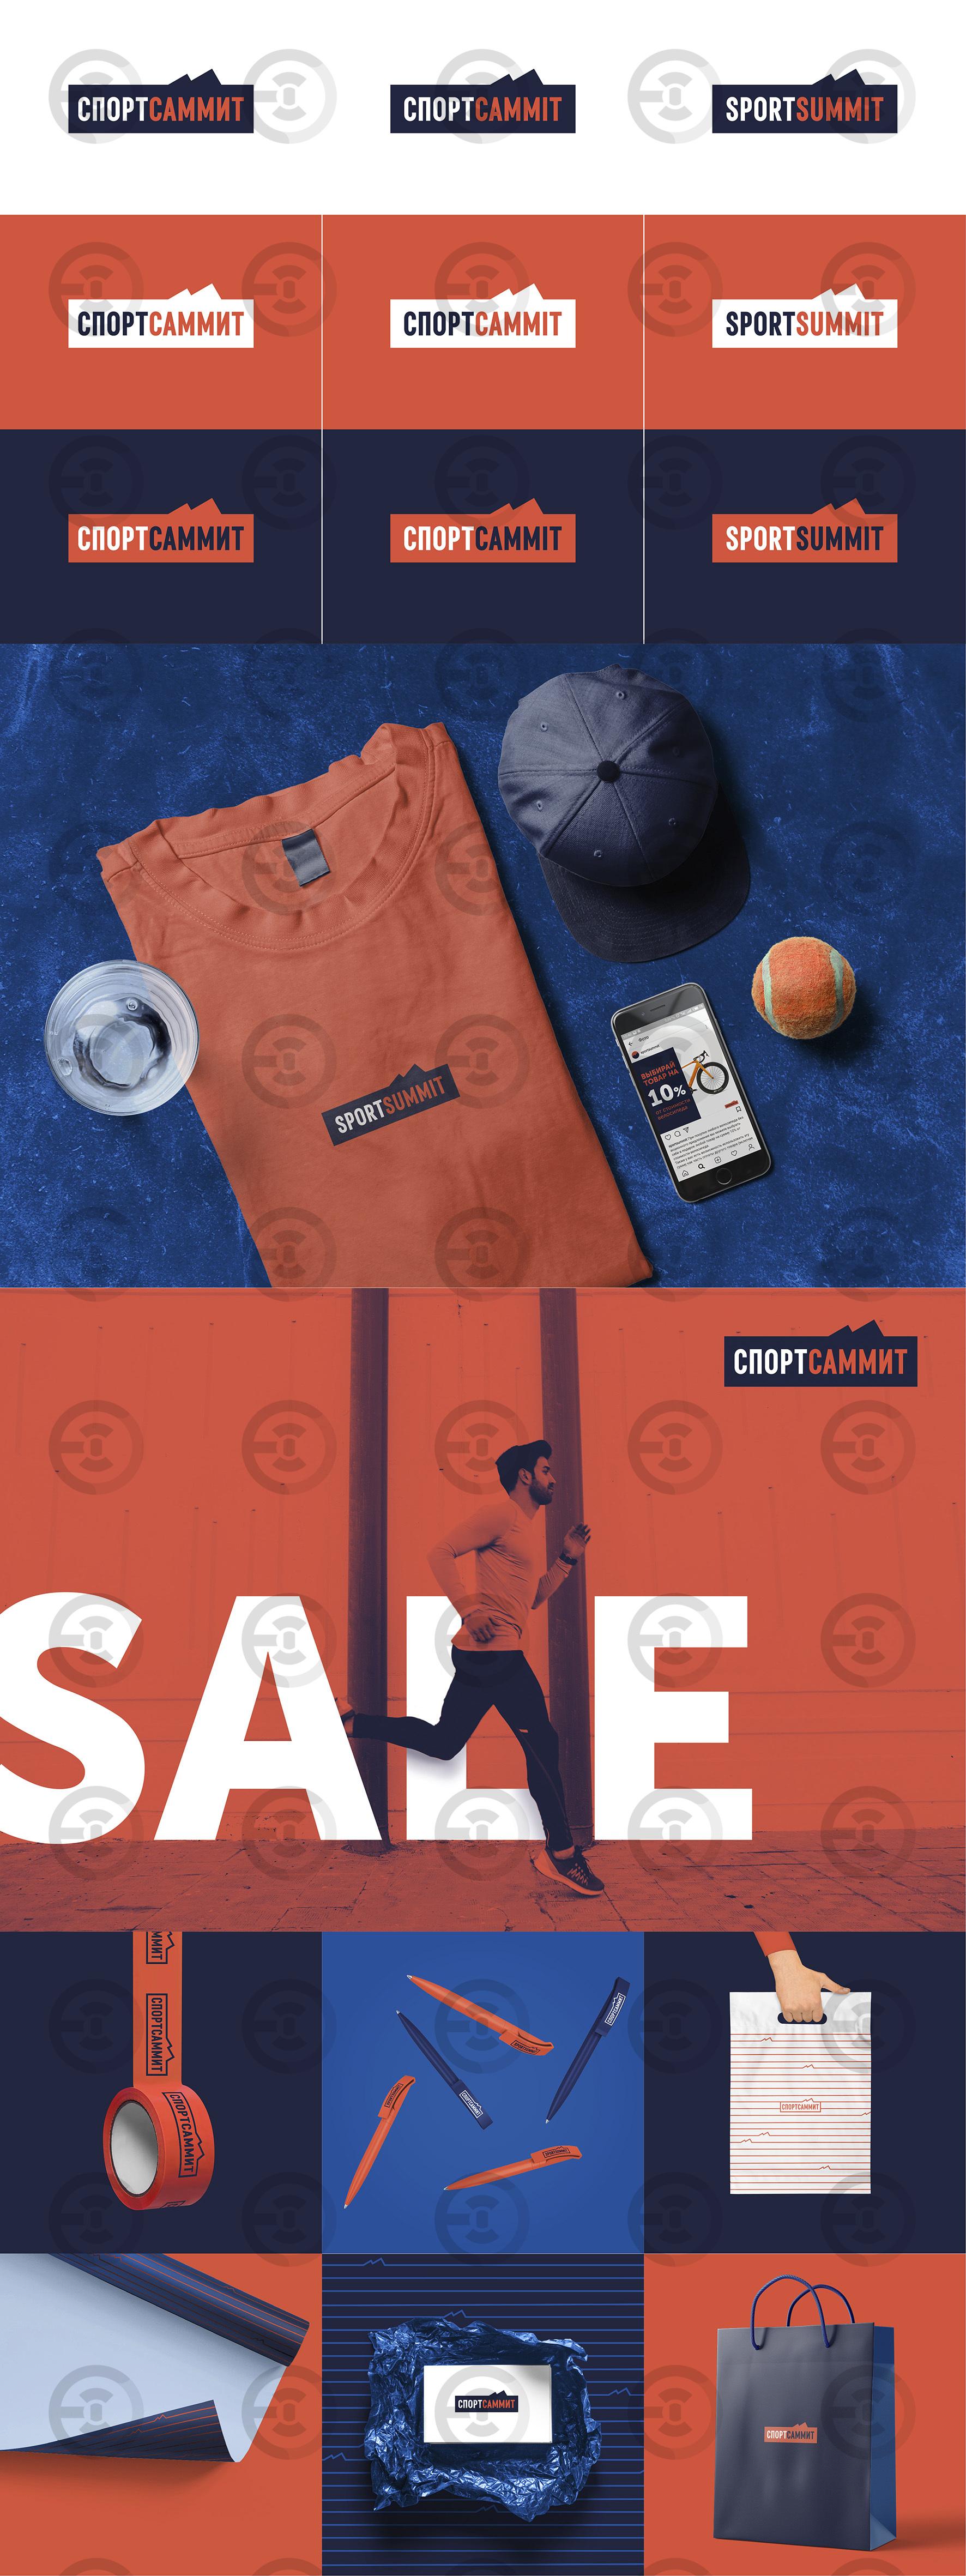 sportsummit_logo1_oksana-ch.jpg